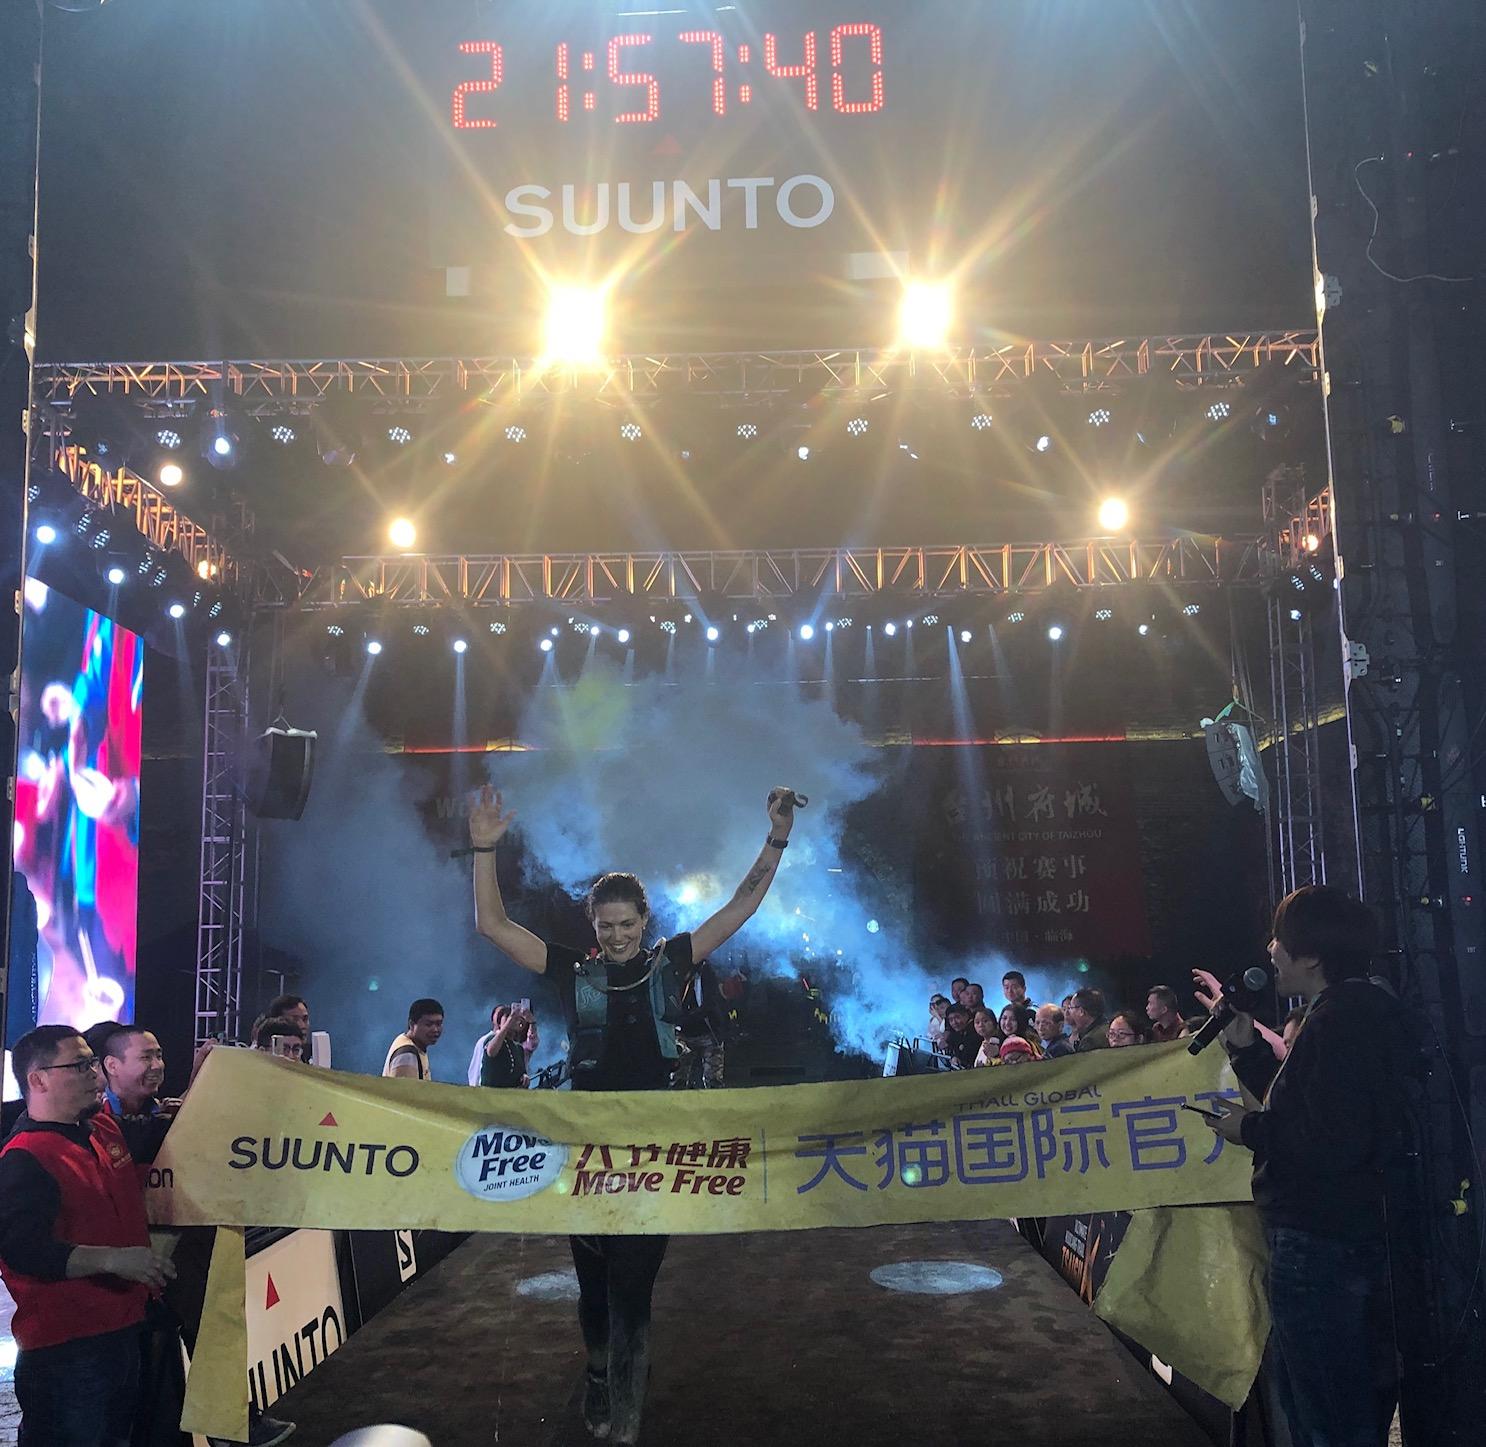 Paulina Svoboda aka Freedom was sick leading up to race weekend but still scored fourth place on the 80k